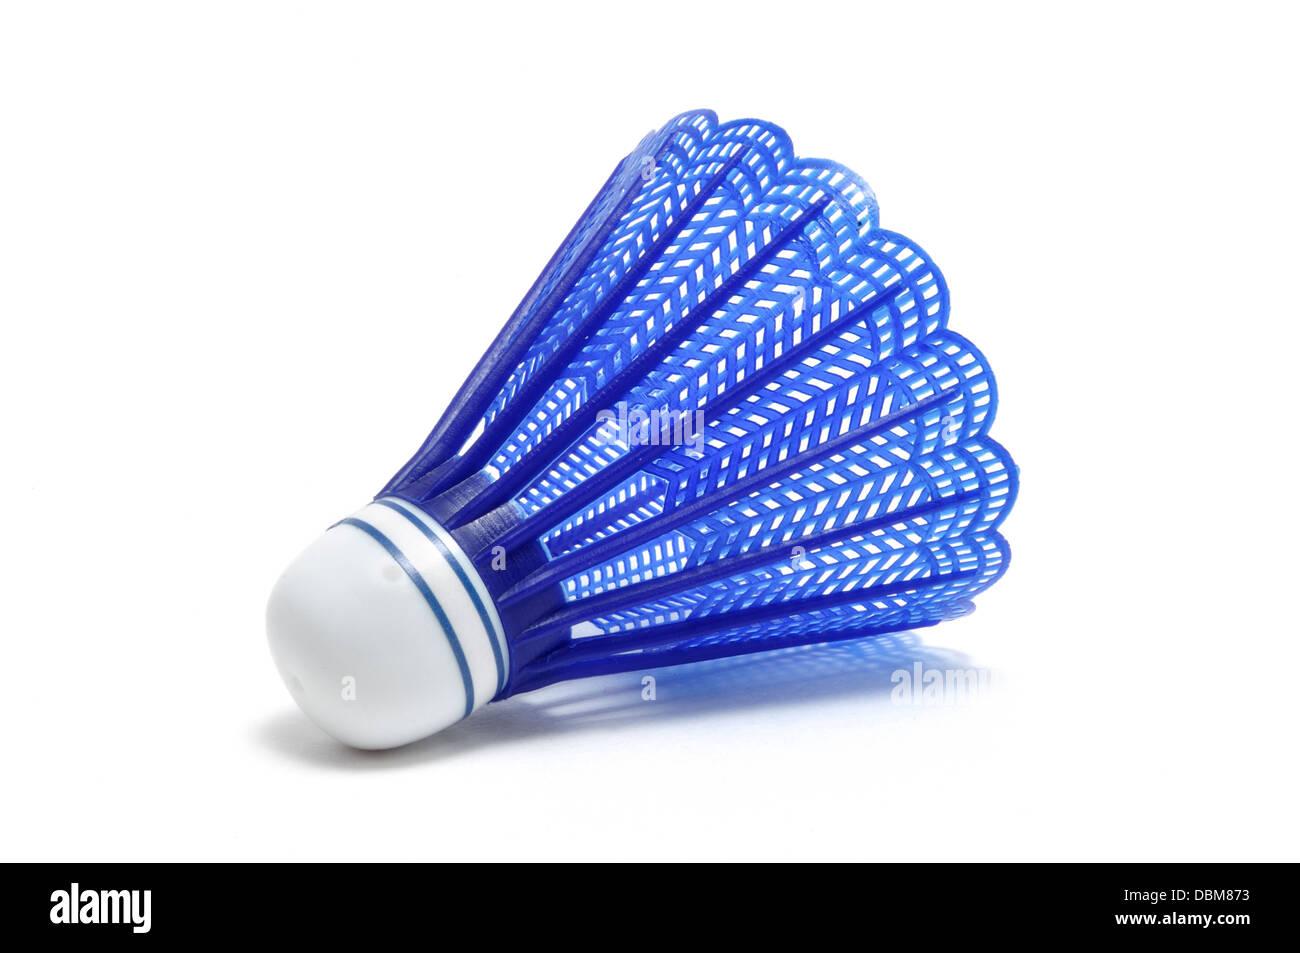 Blue Badminton Shuttlecock (Birdie) isolated on white - Stock Image